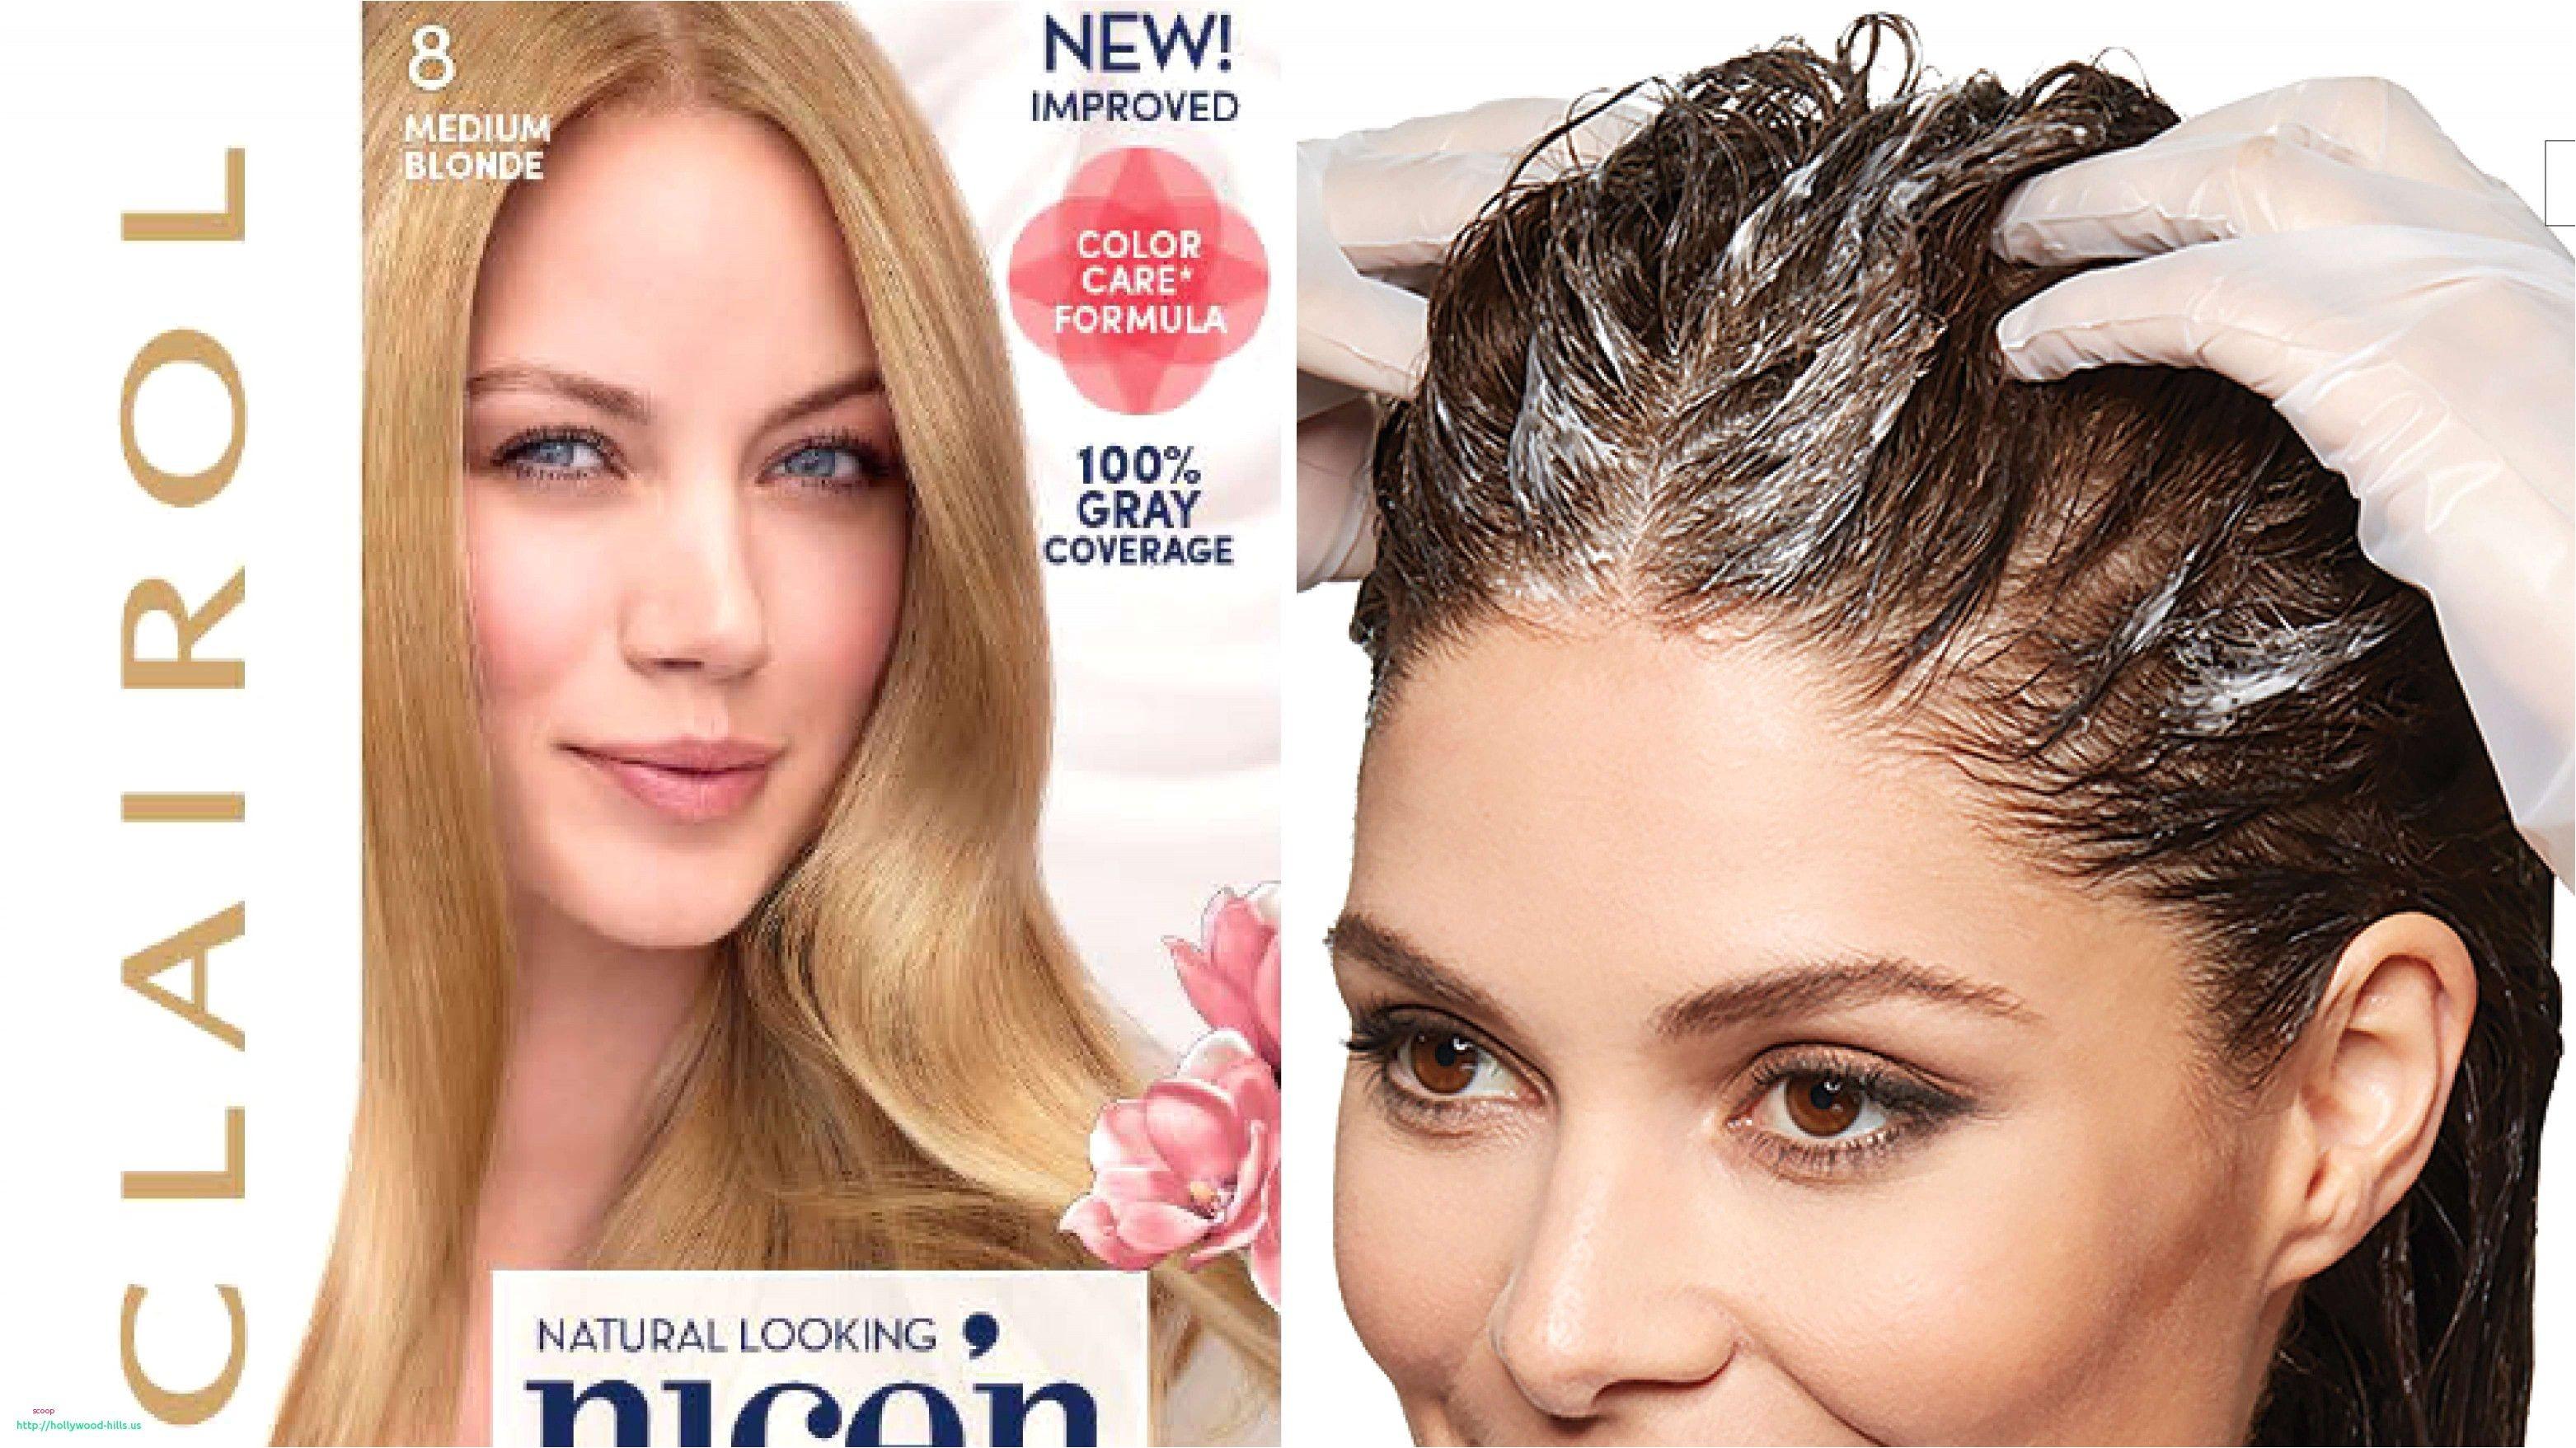 Hair Dye Styles Beautiful I Pinimg 1200x 0d 60 8a 0d608a58a4bb3ed3b As Well Straight Hair Types 25 Luxury Easy